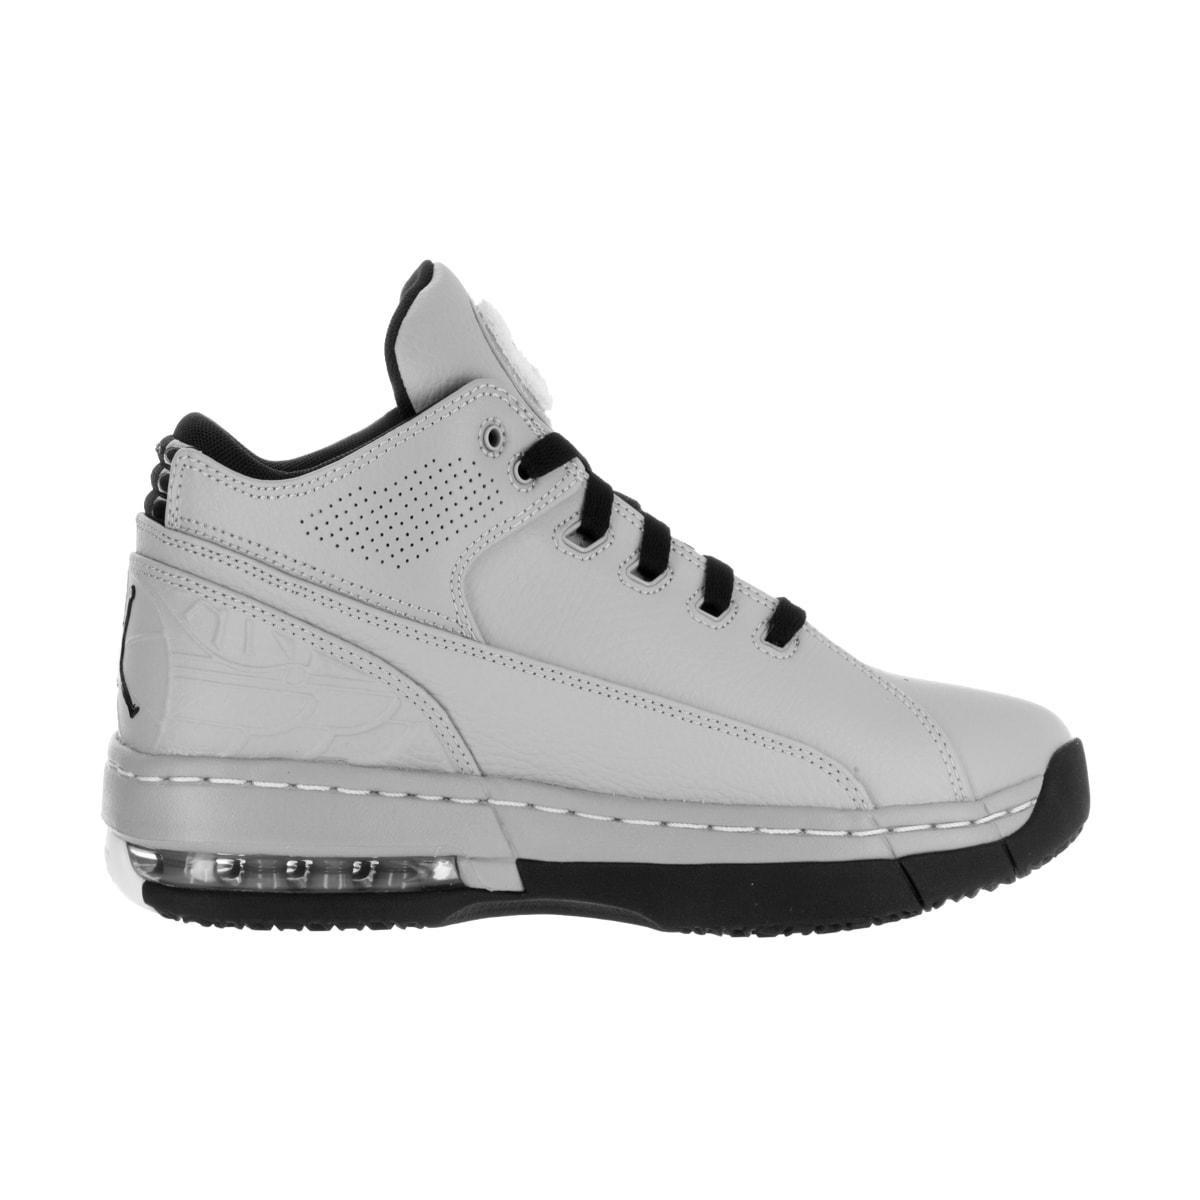 9b2e77903f25 Shop Nike Jordan Men s Jordan Ol School Low Wolf Grey Black White Basketball  Shoe - Free Shipping Today - Overstock - 13395488